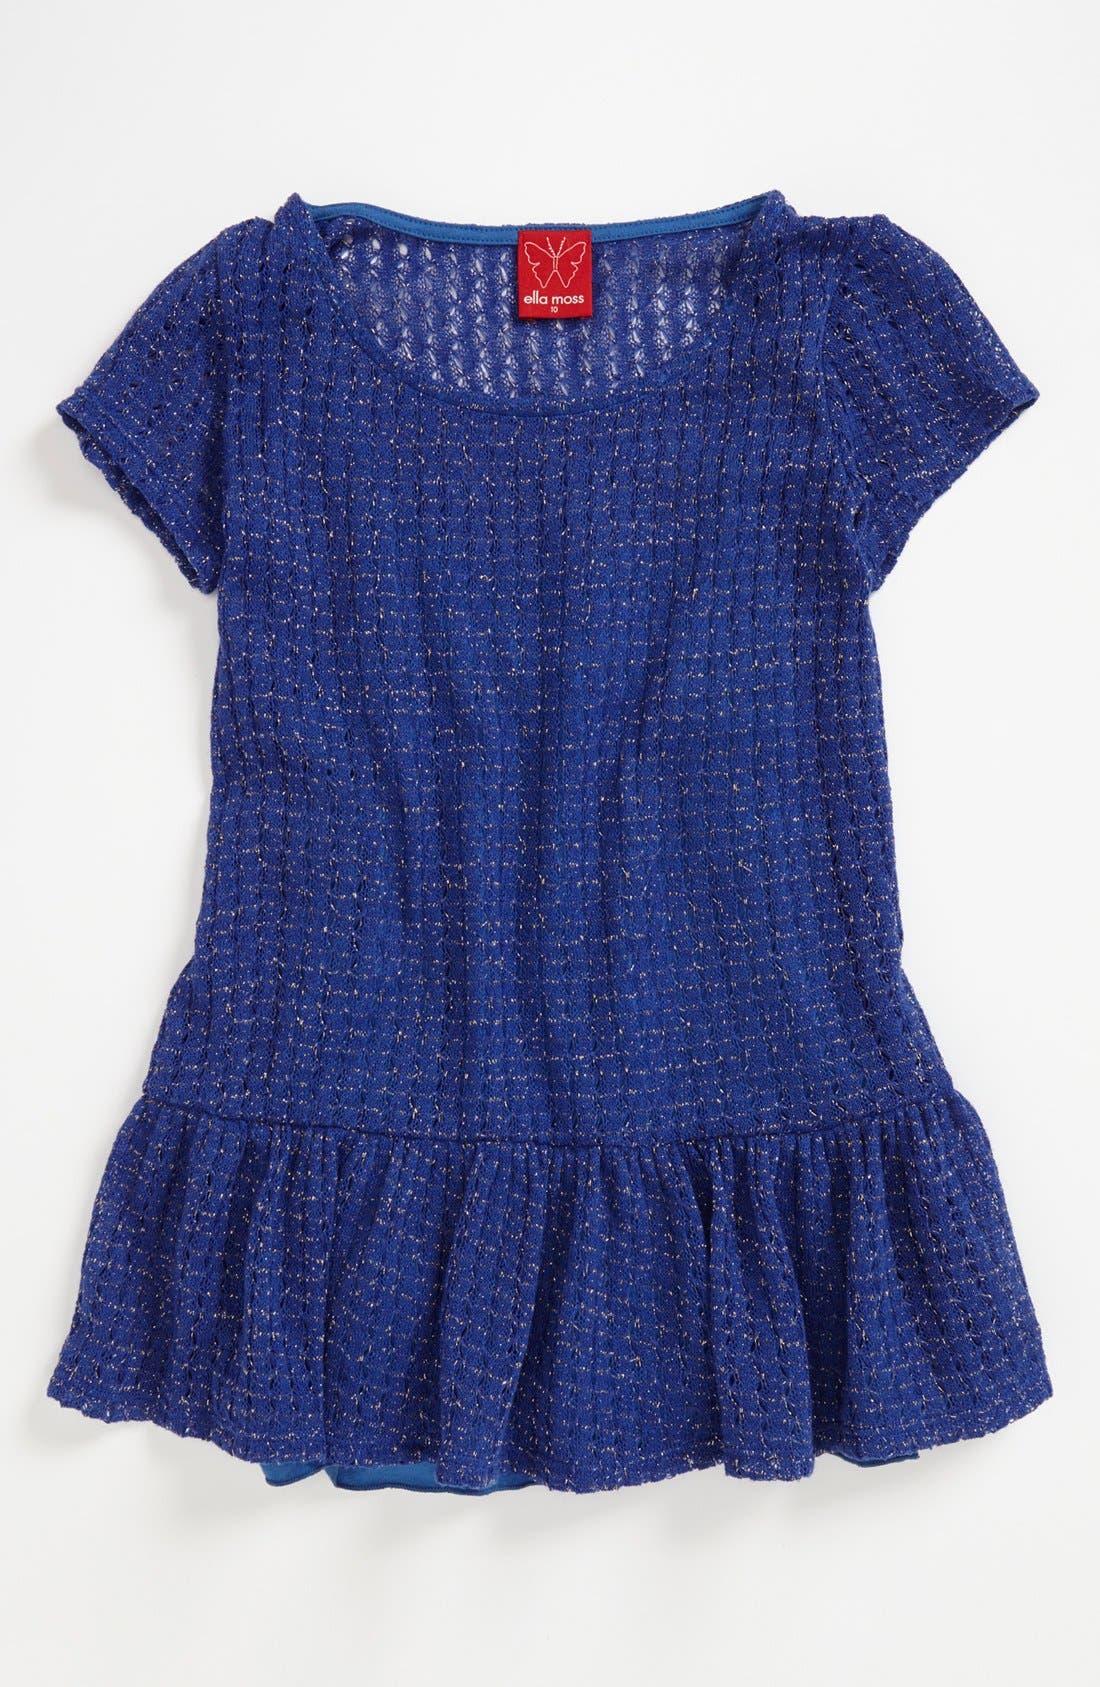 Alternate Image 1 Selected - Ella Moss Peplum Top (Big Girls) (Online Only)